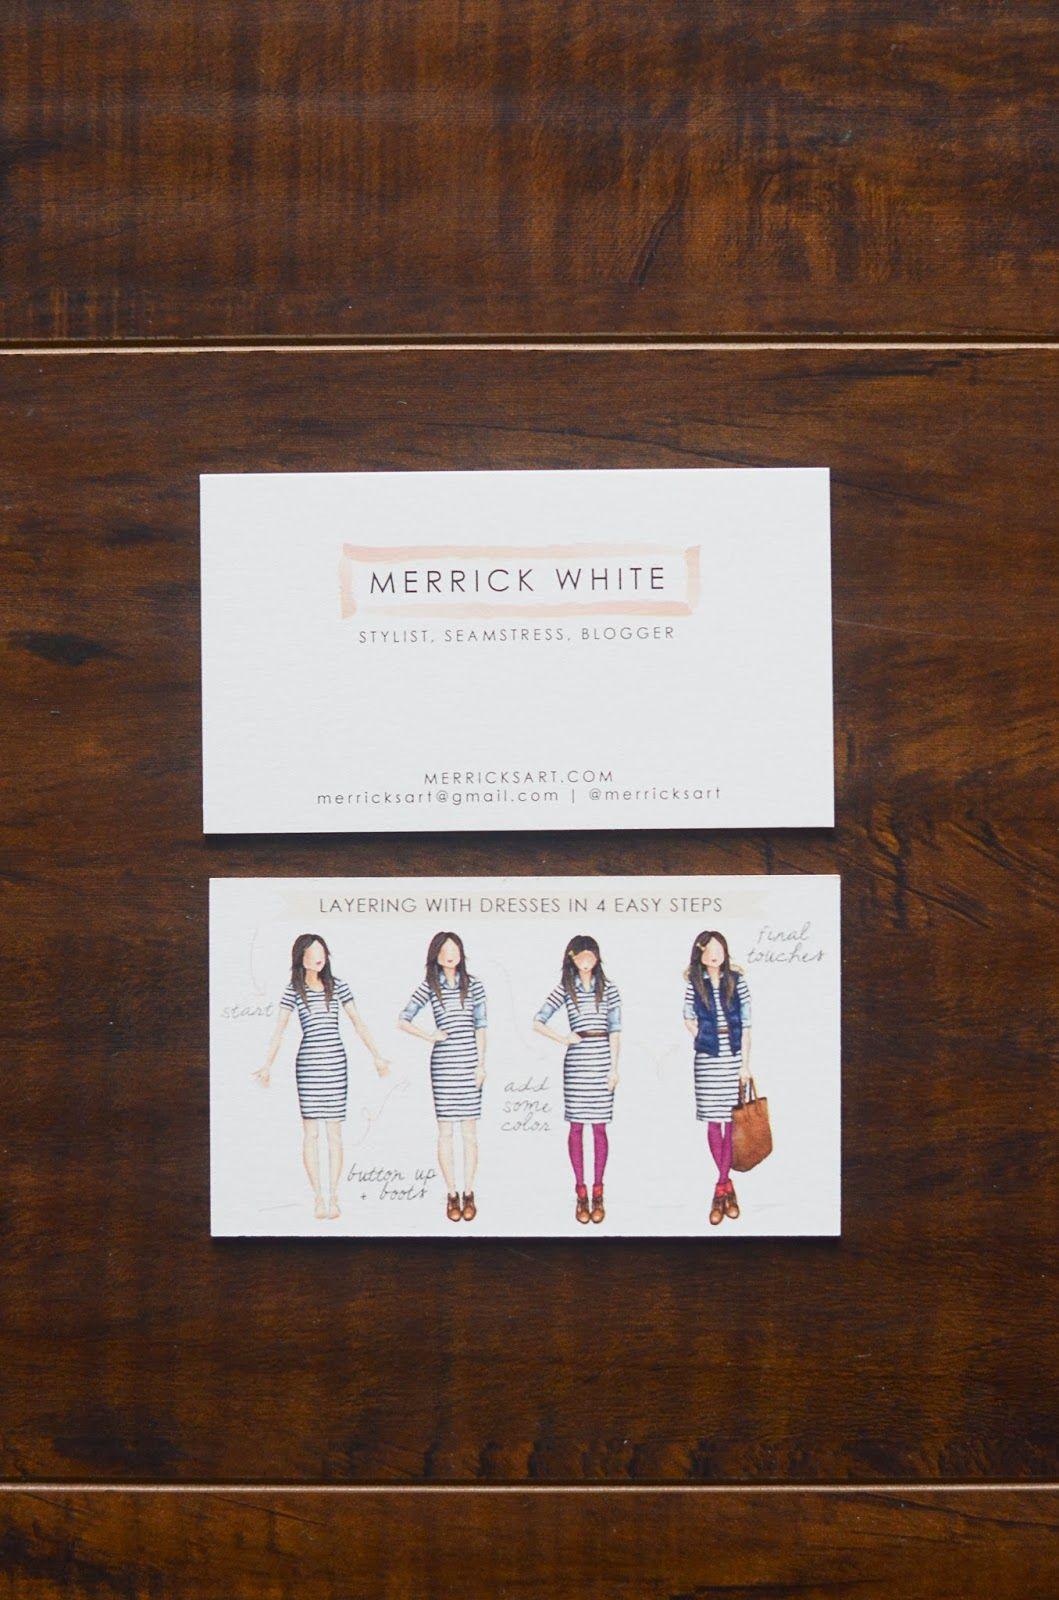 ALT SUMMIT ESSENTIALS: BUSINESS CARDS + MEDIA KITS | Business cards ...